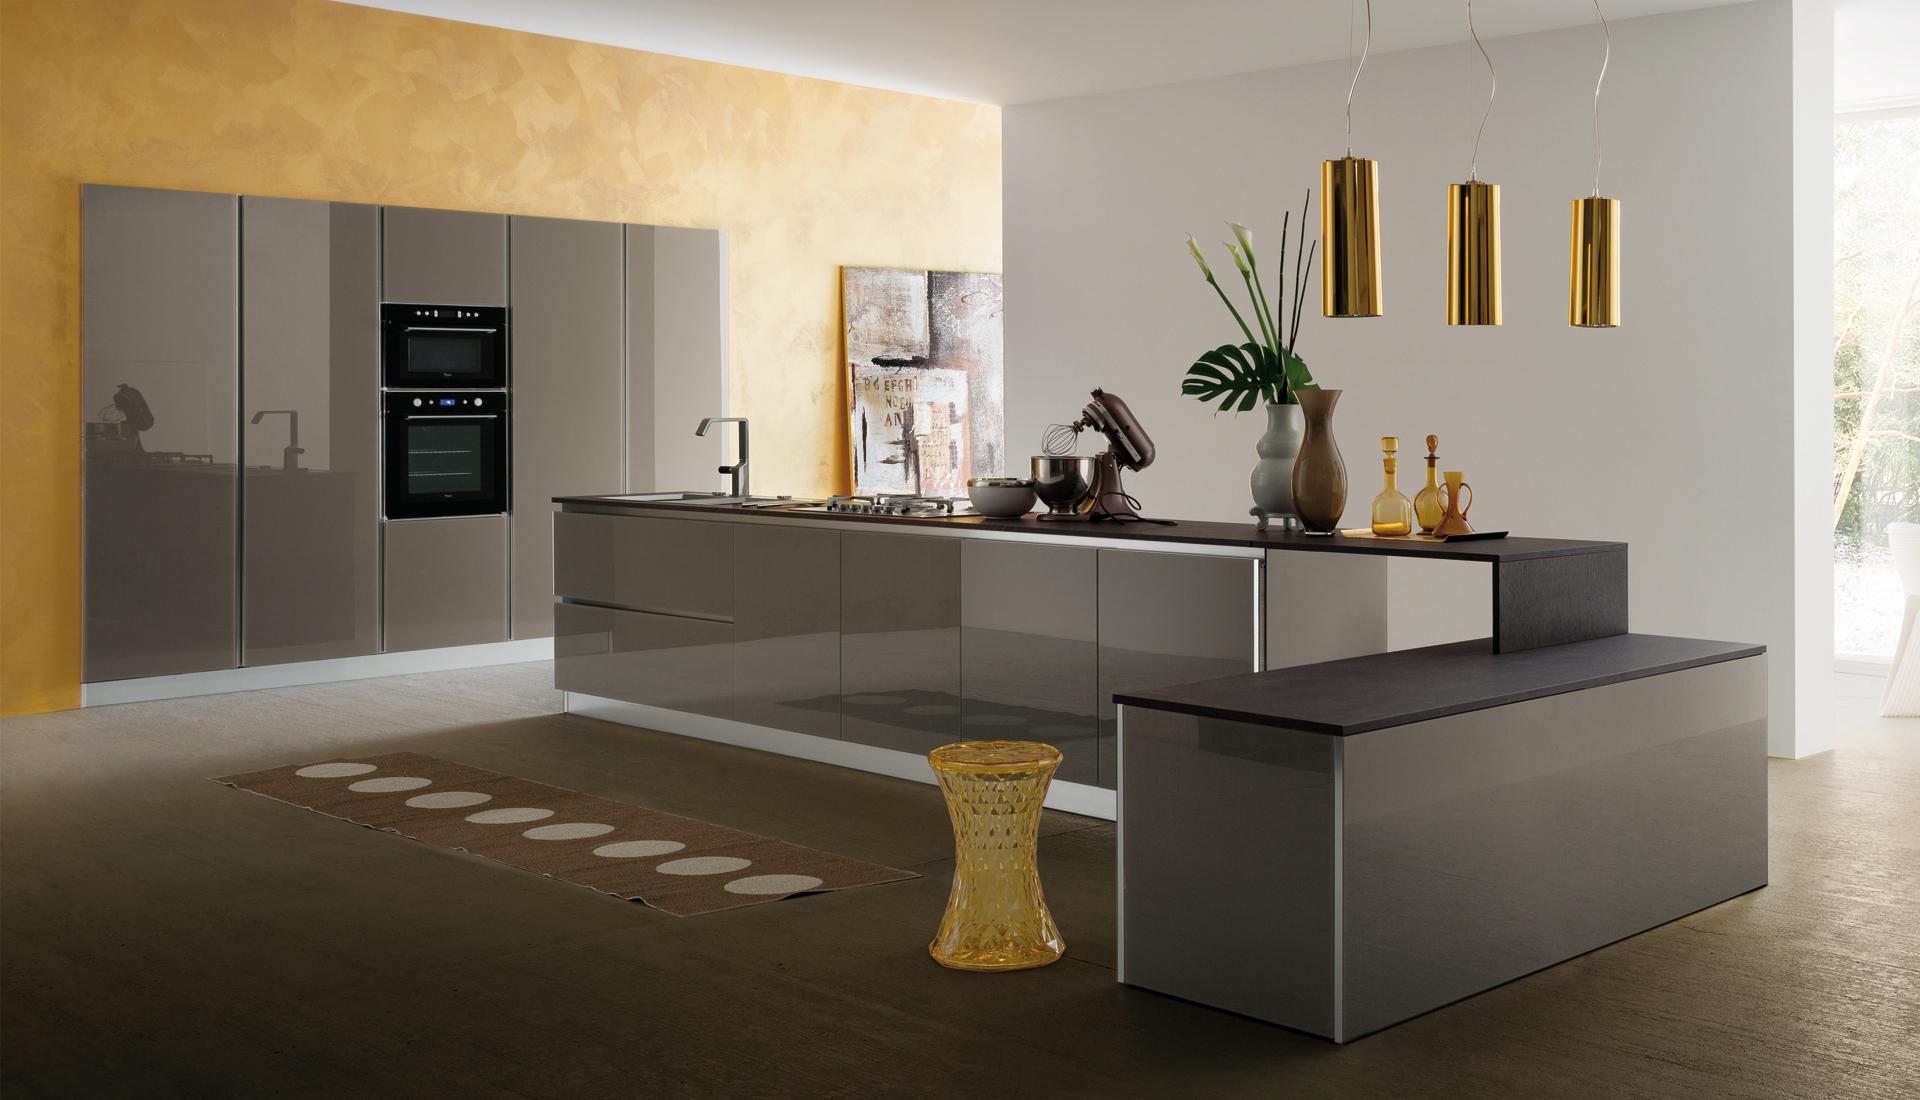 Forum casa e arredamento forum arredare casa ristrutturare - Cucina moderna immagini ...